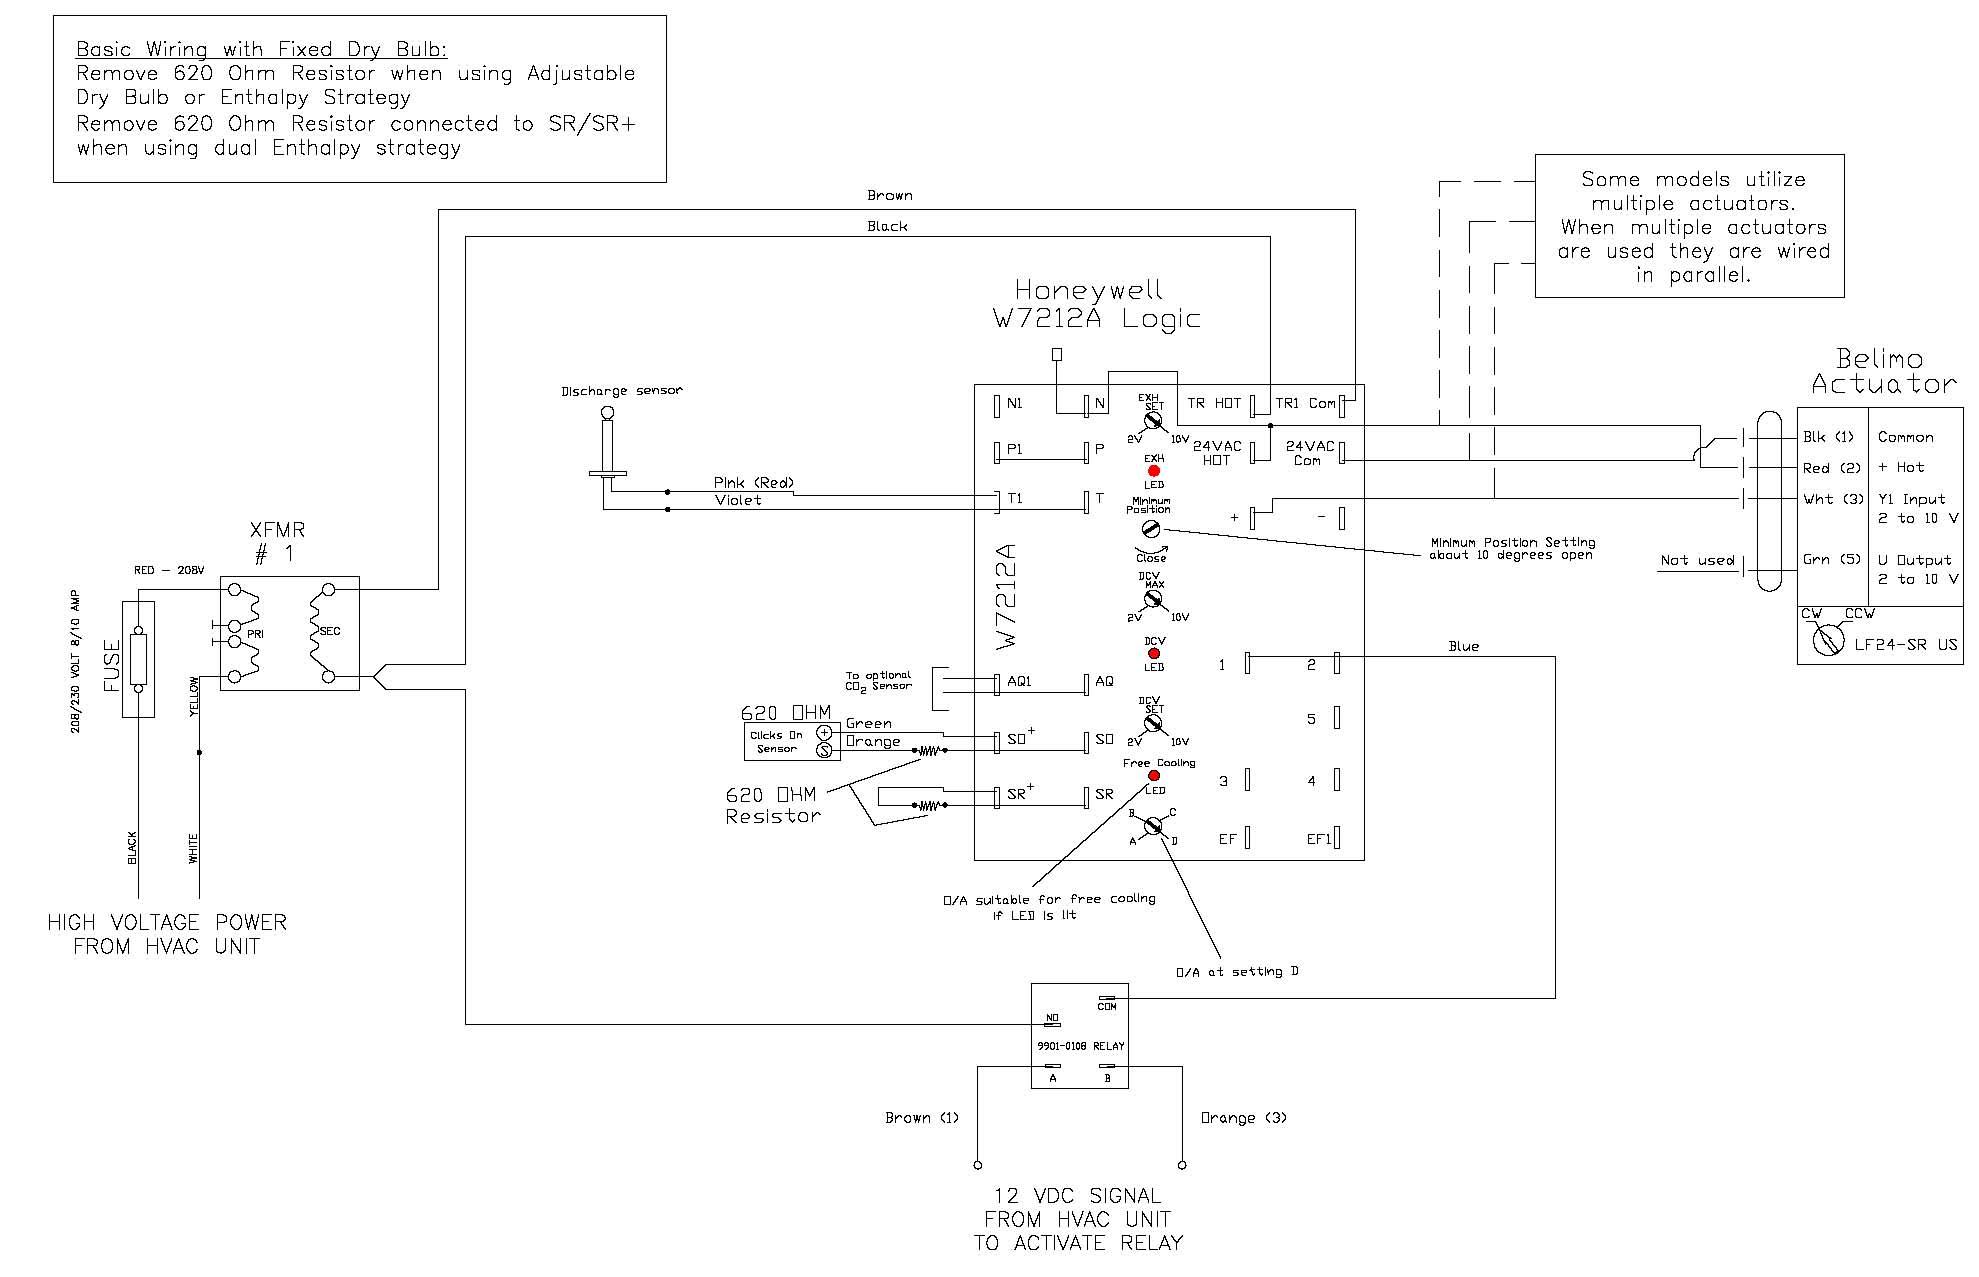 York Ac Schematics Y14 | Wiring Diagram York Wiring Diagrams Air Conditioners on